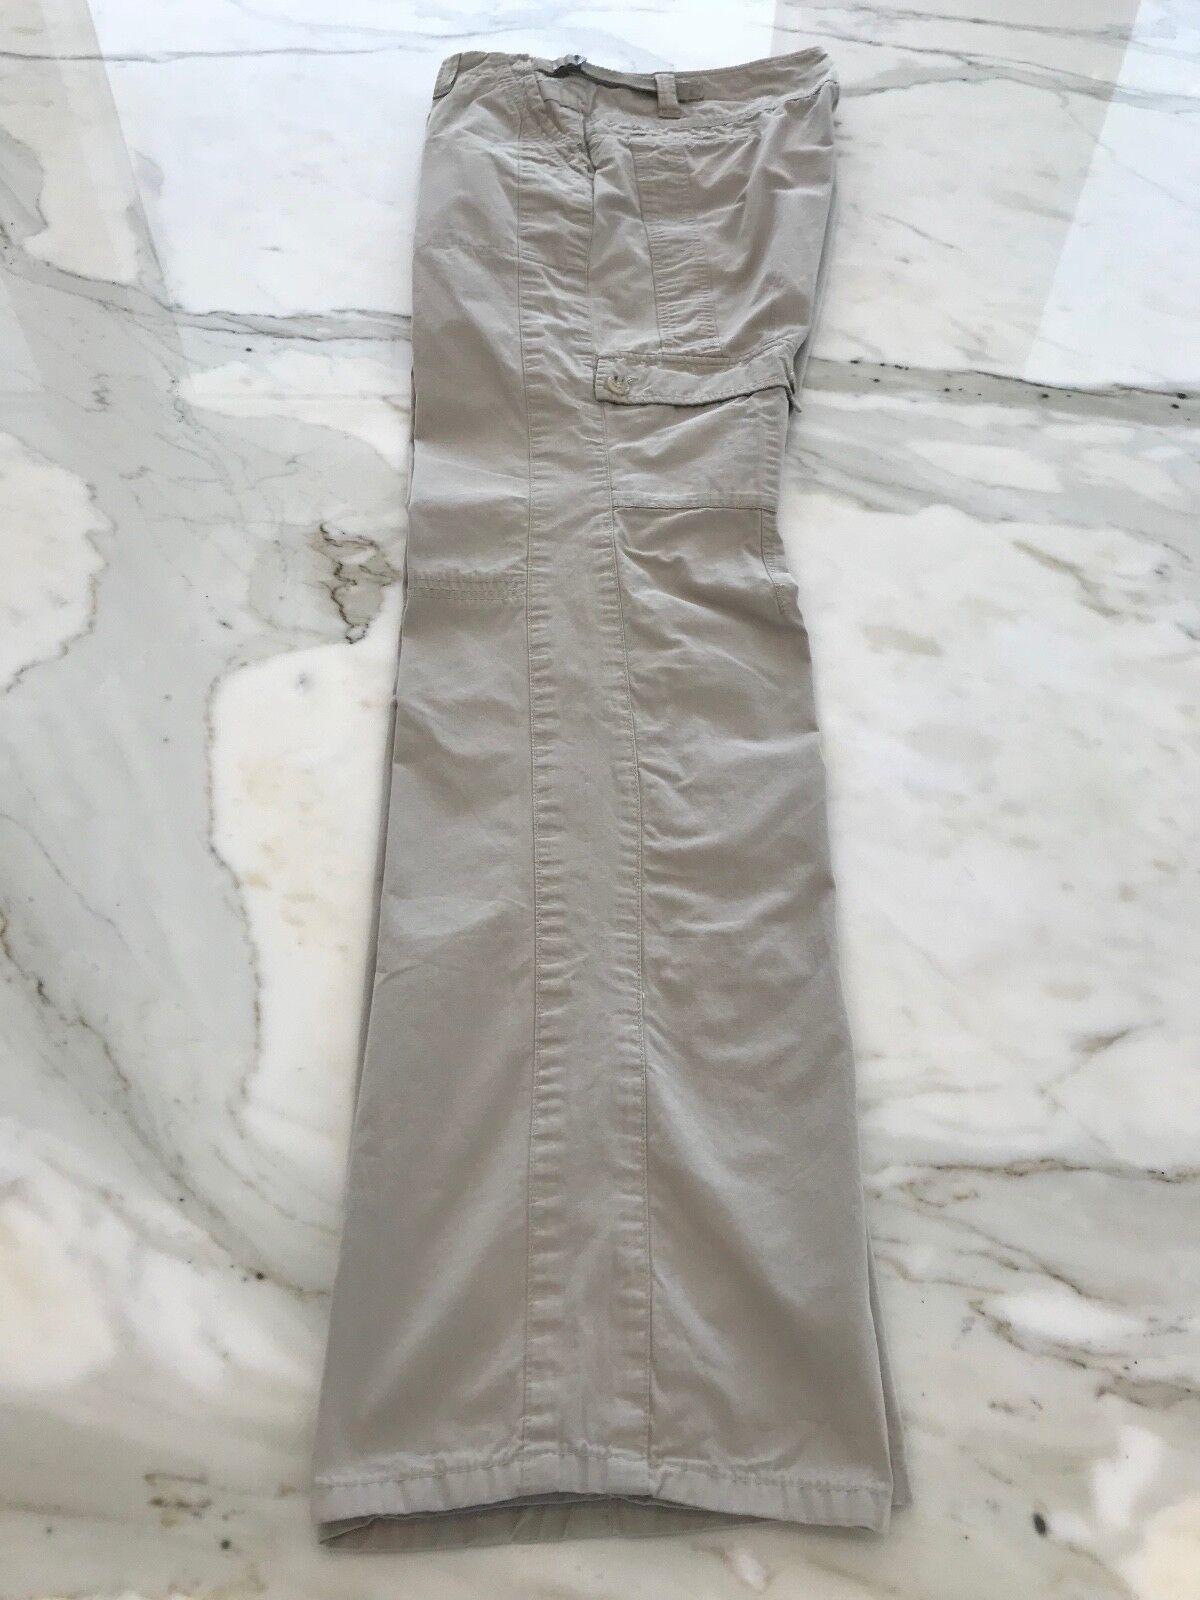 THEORY FANYAN SPIRIT BEIGE COTTON CARGO PANTS 606… - image 2